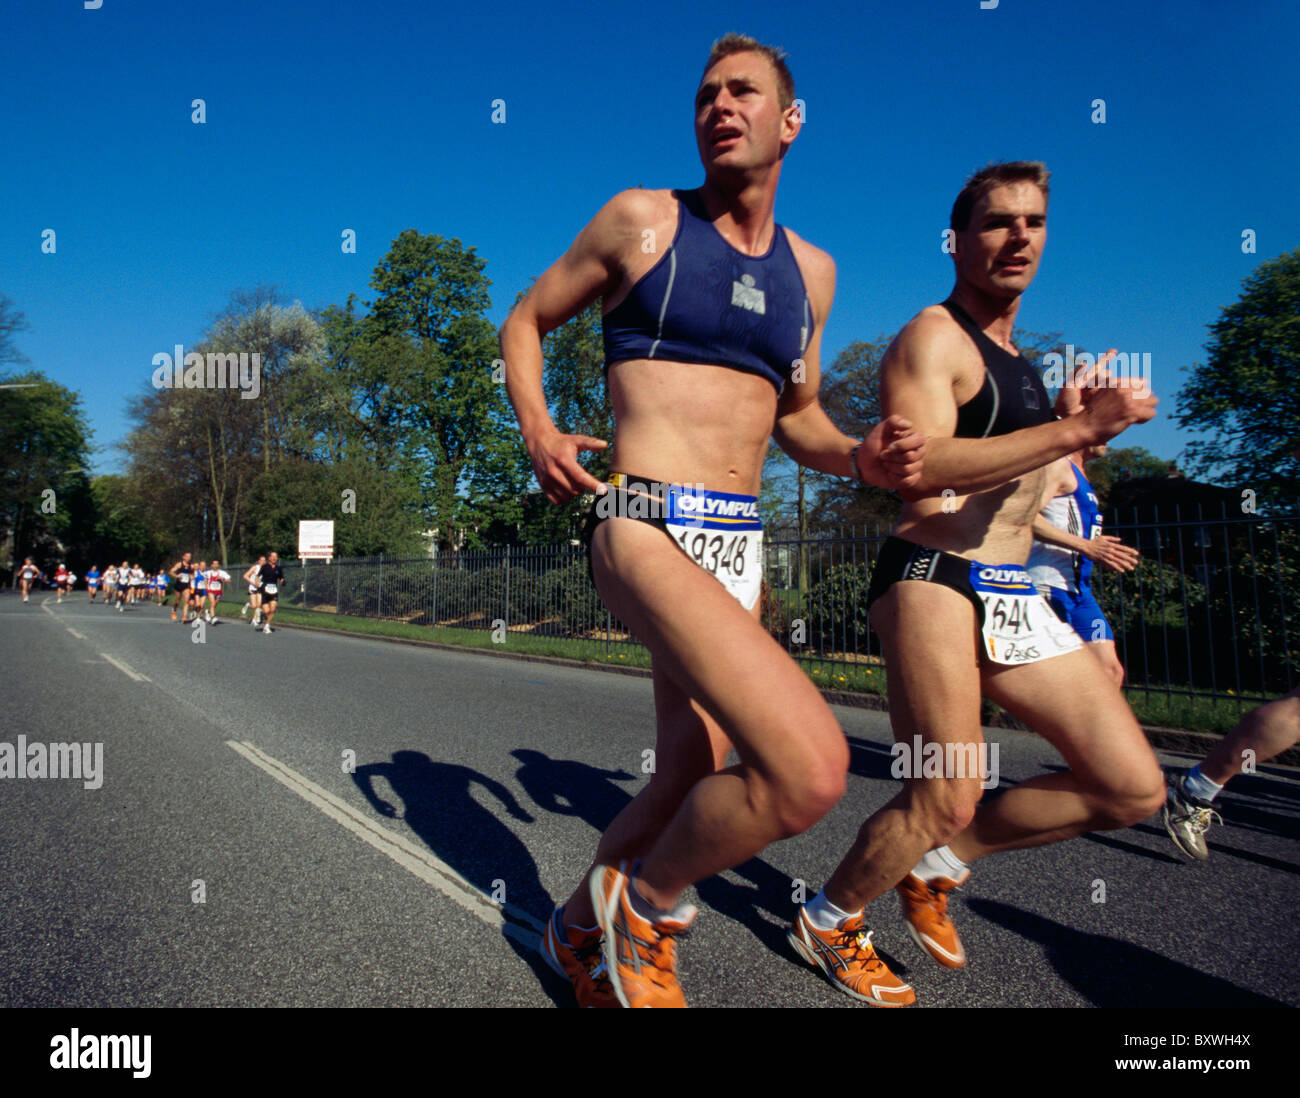 Runner at Hanse-Marathon in Hamburg, Germany - Stock Image